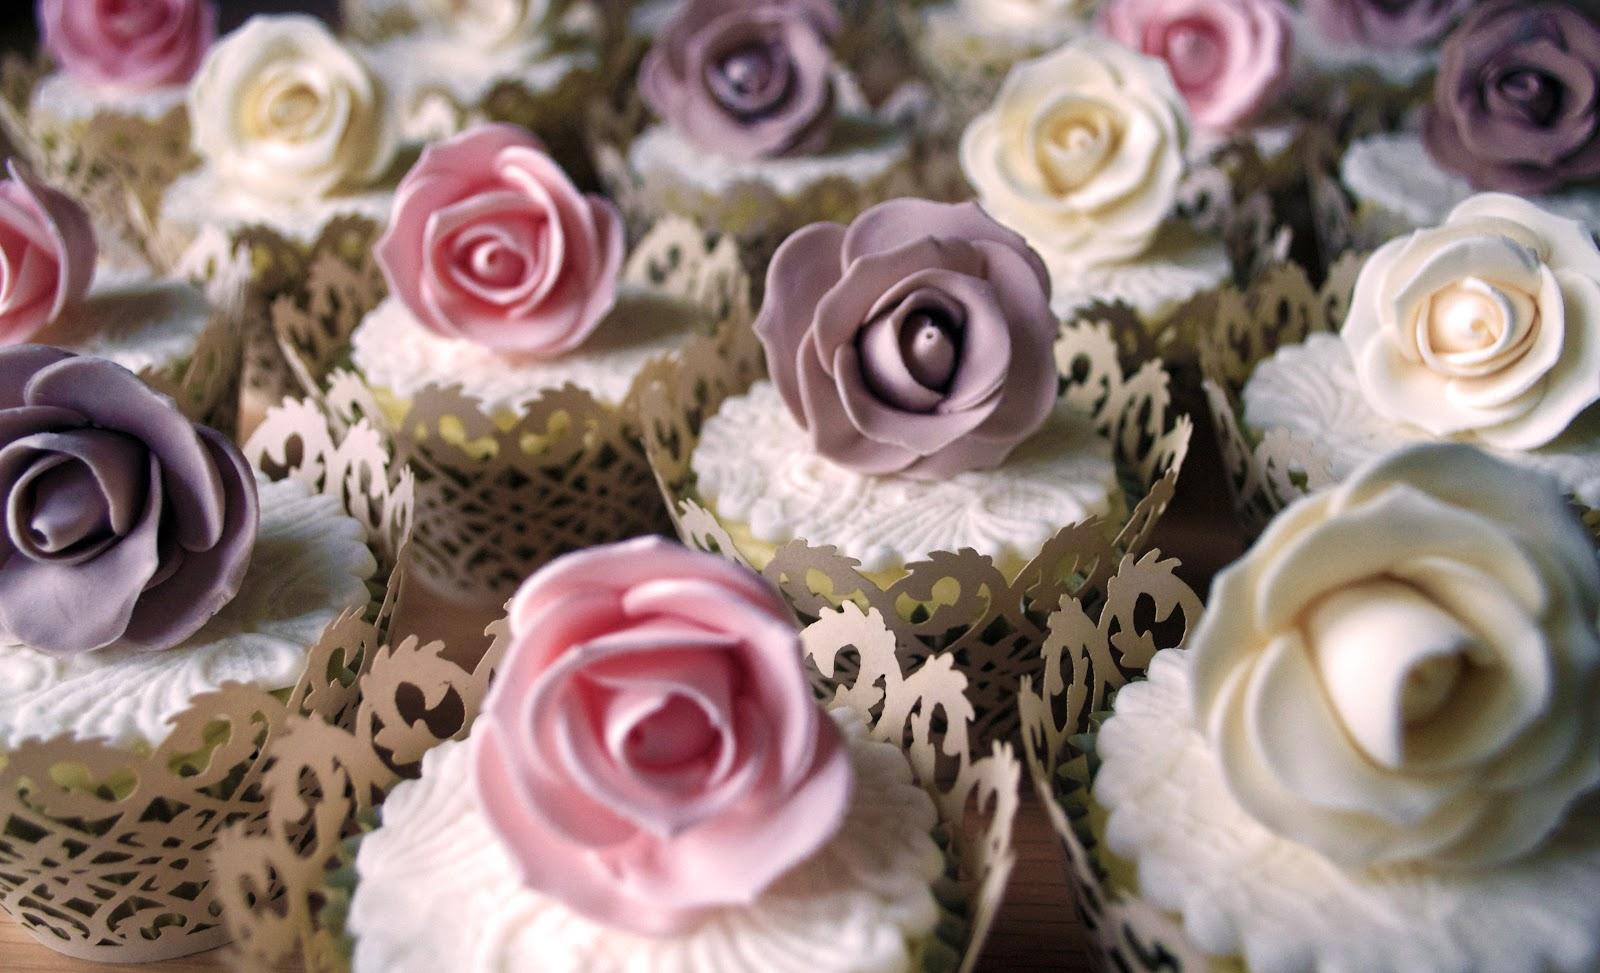 Vintage Rose & Lace Cupcake Tower